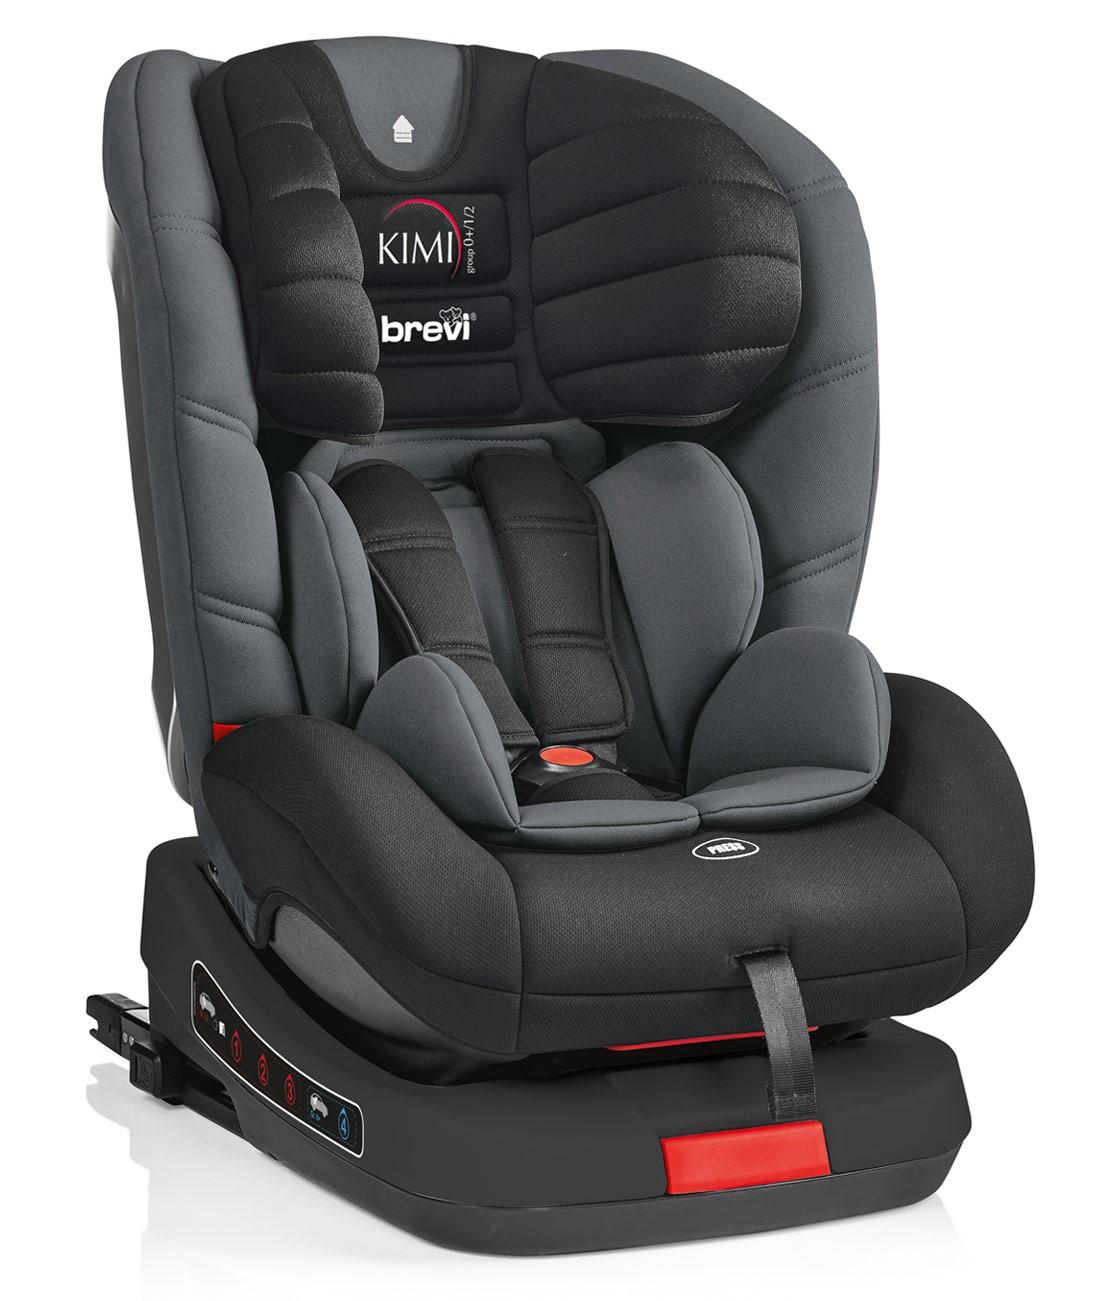 Seggiolino Auto Brevi Kimi Isofix TT